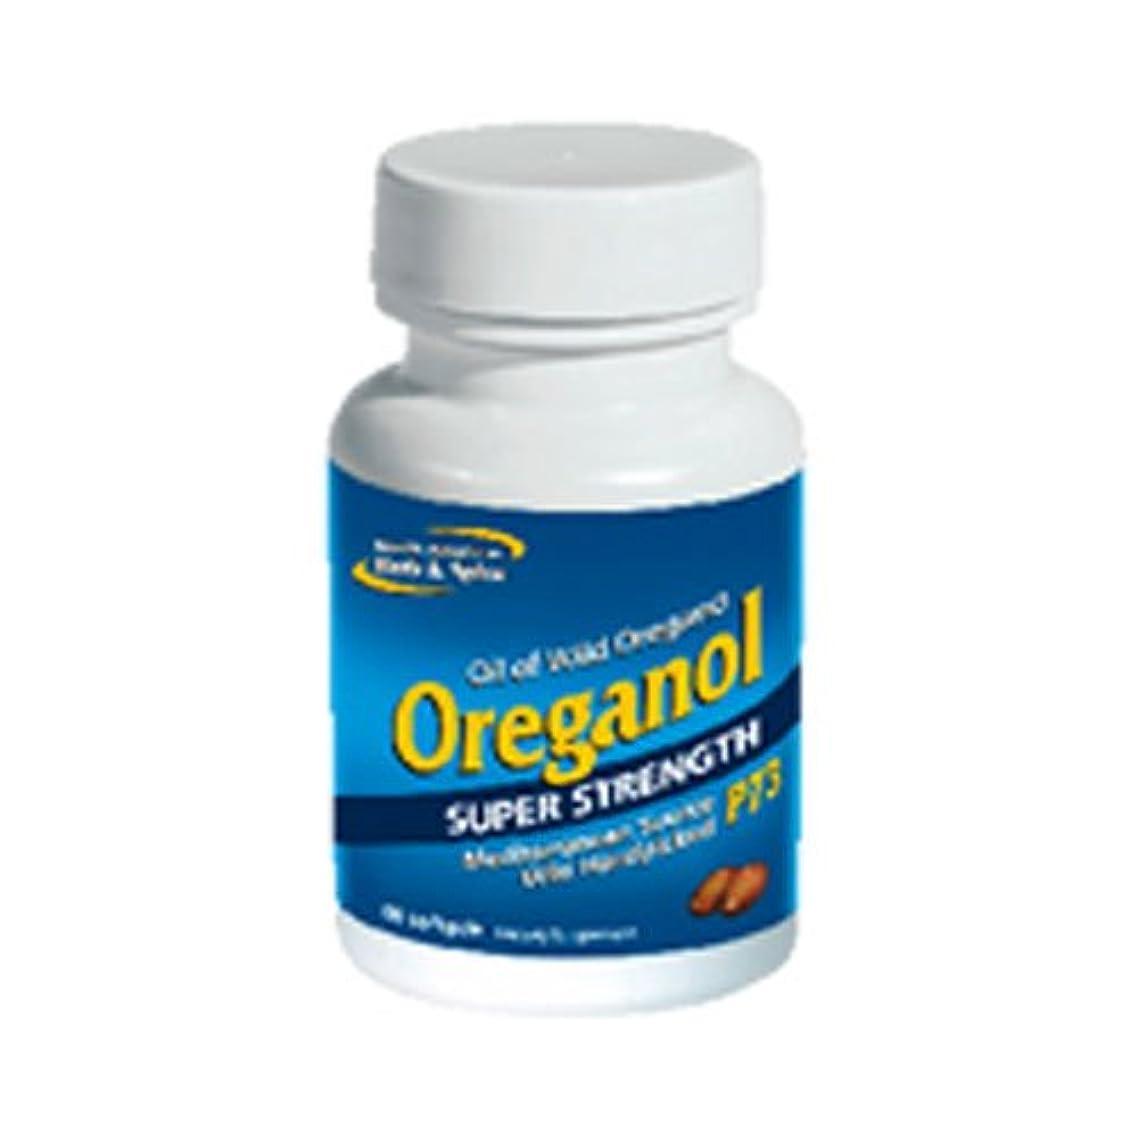 North American Herb & Spice Oreganol P73 Super Strgth 60 Sgel